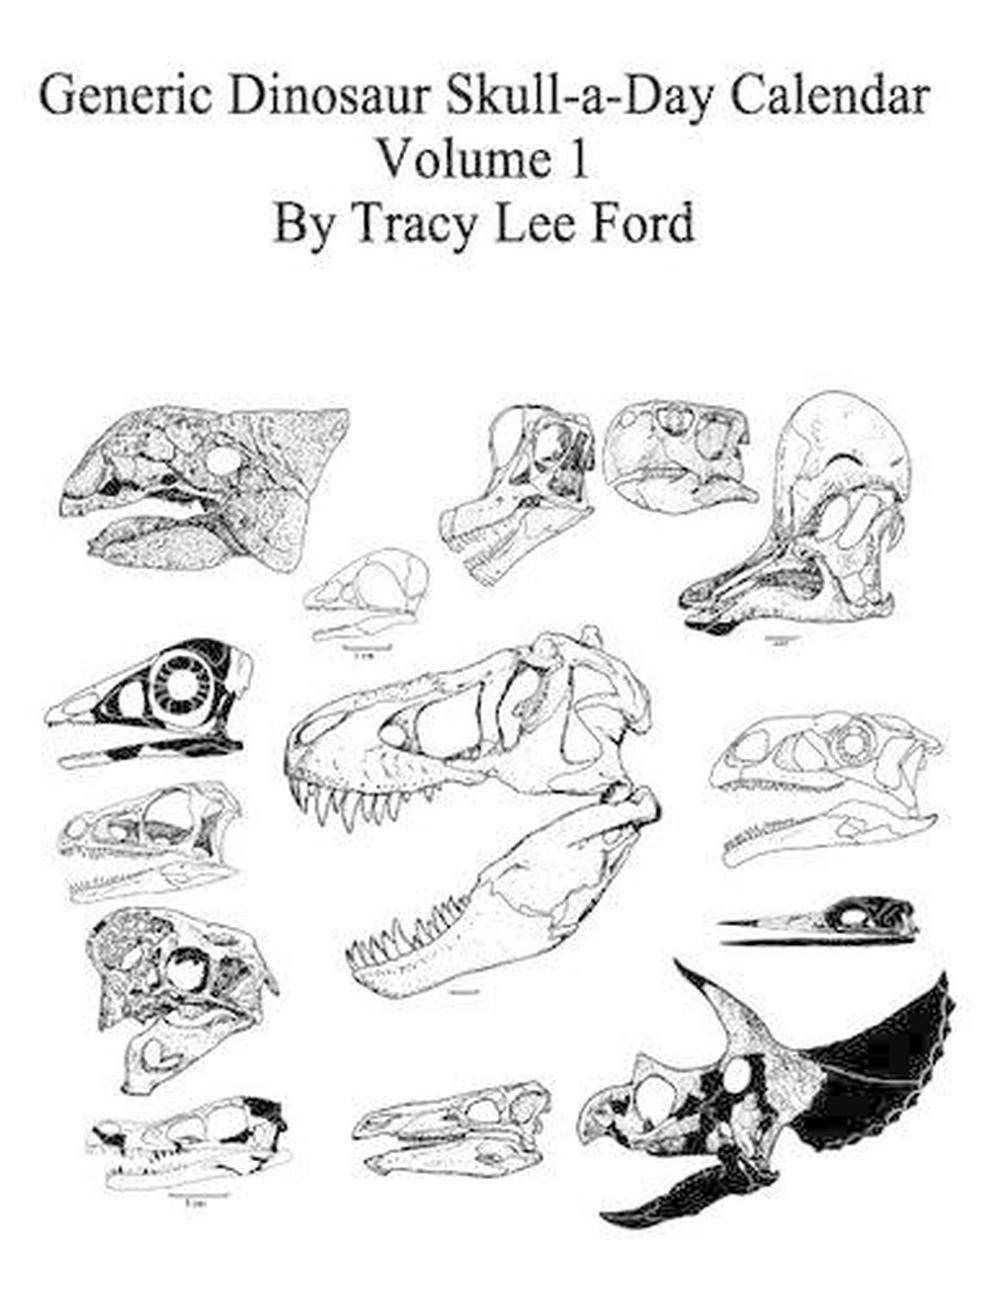 Generic Dinosaur Skull-A-Day Calendar, Volume 1: 366